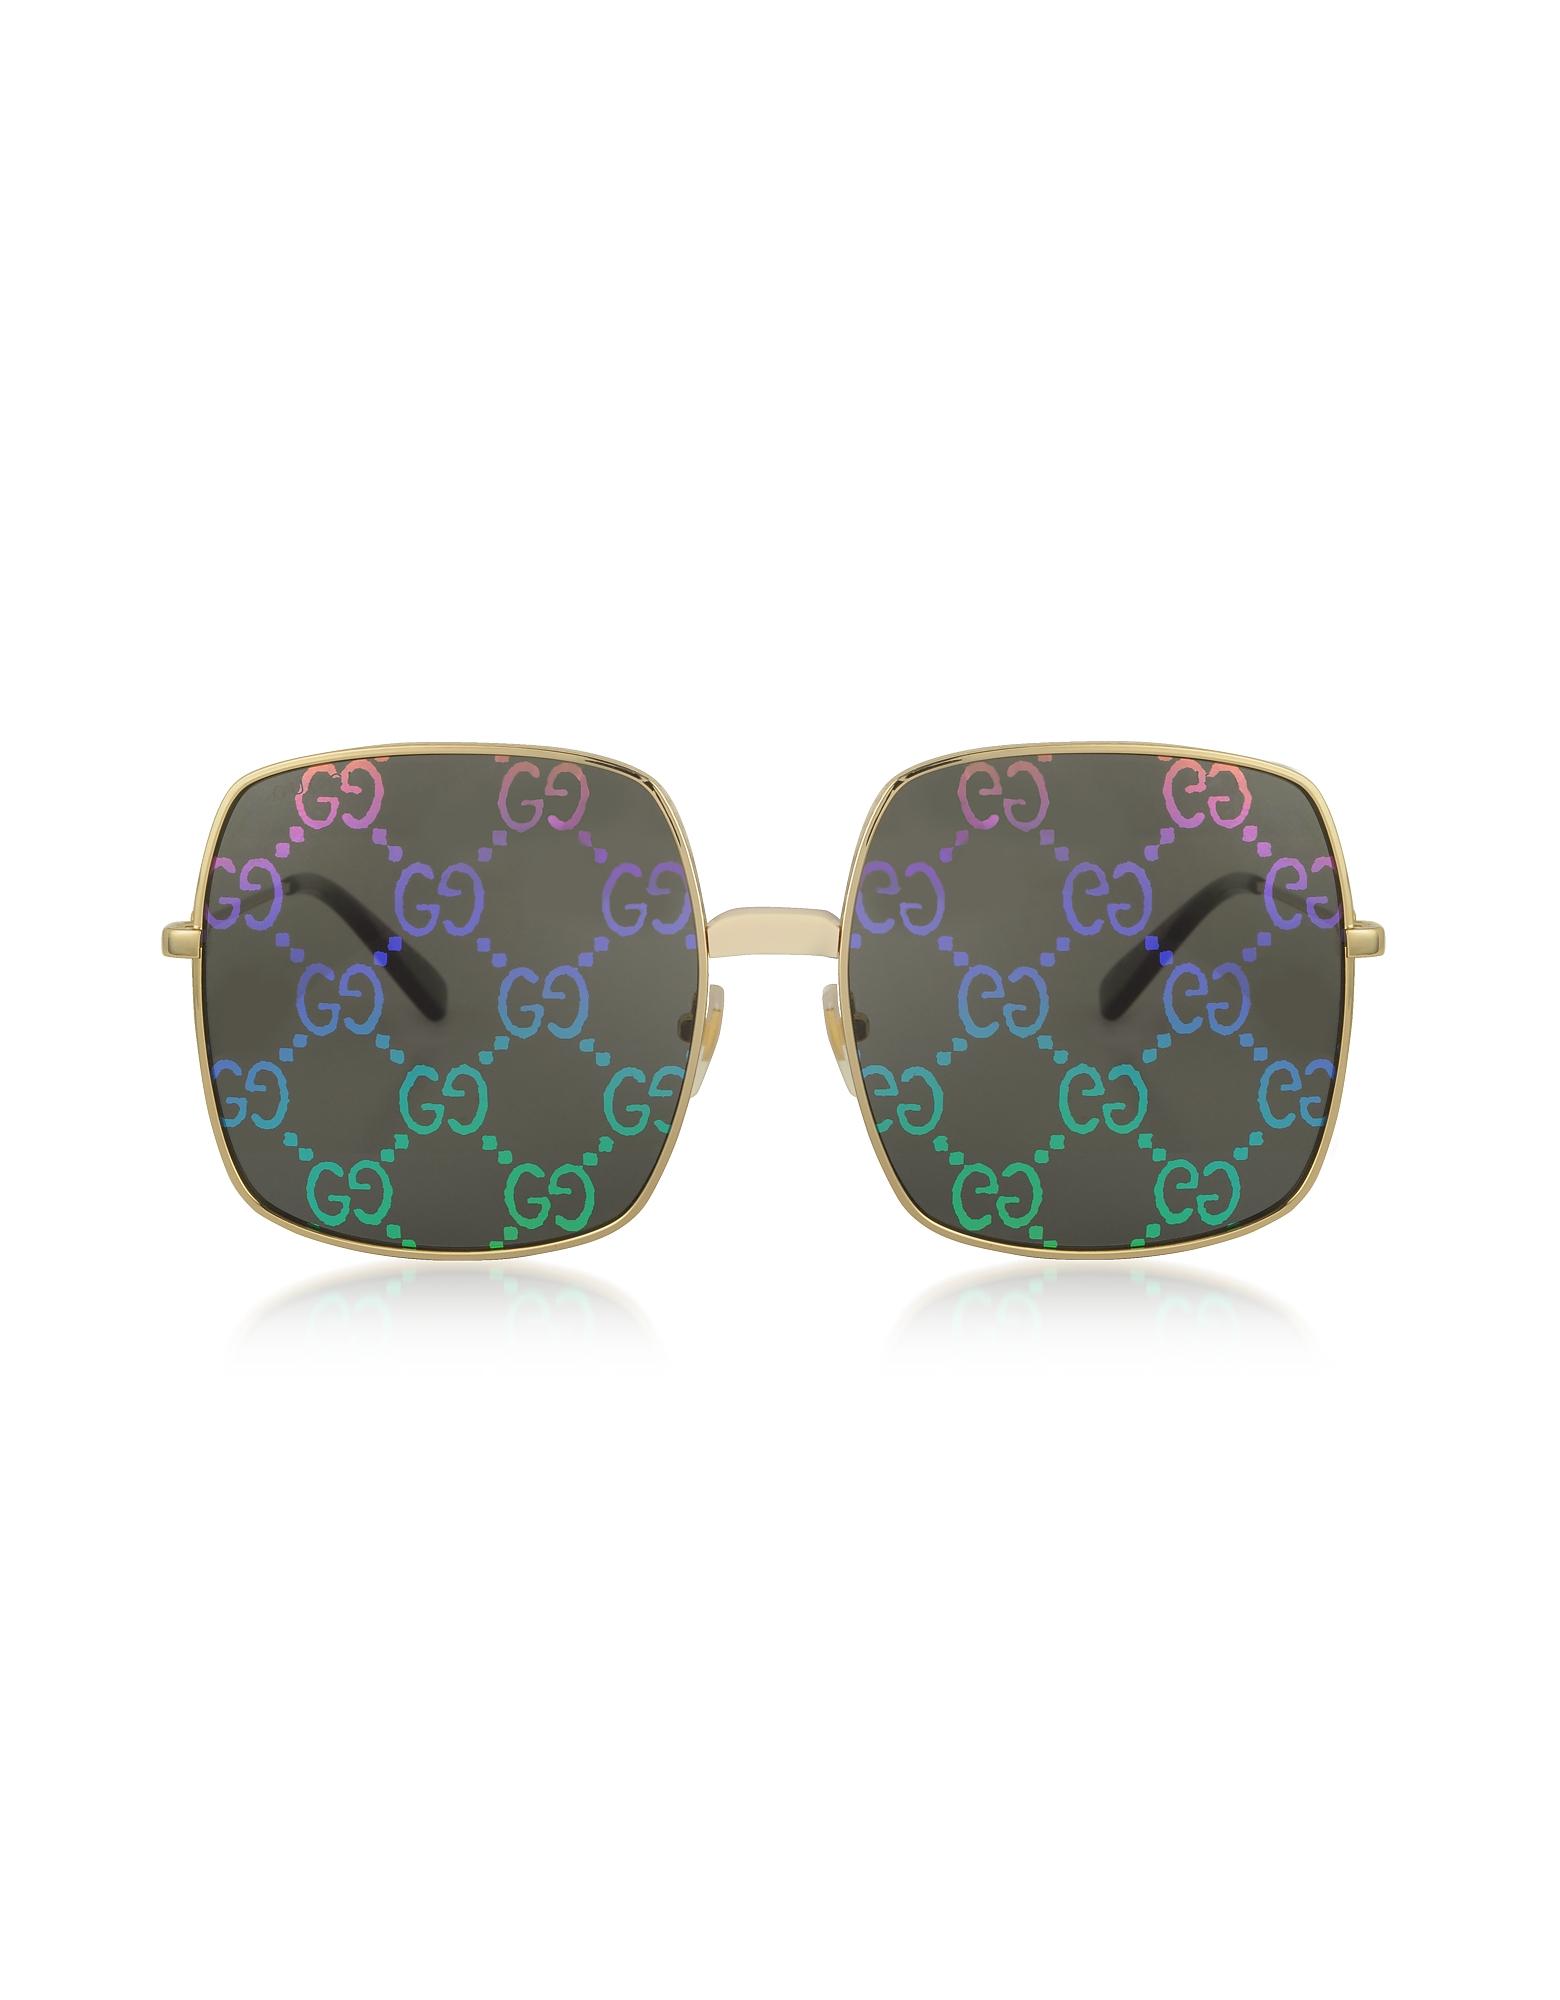 Gucci Sunglasses, Rectangular-frame Metal Sunglasses w/ GG Pattern Lenses